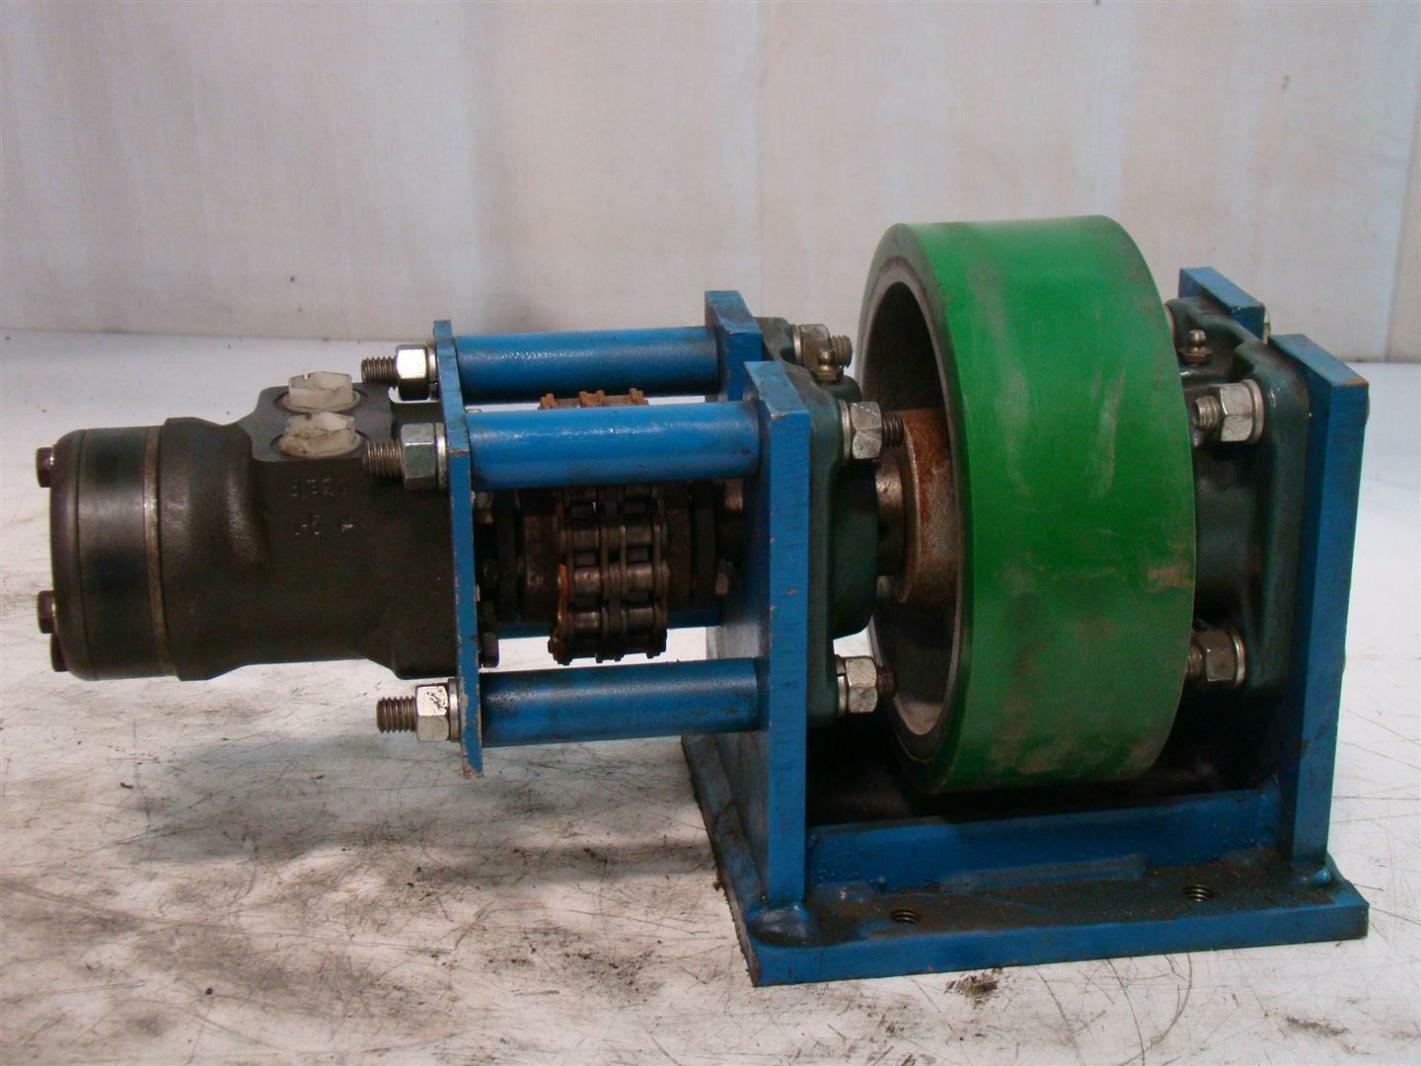 Danfoss Hydraulic Motor Urethane Roller 2605 Dh160 151